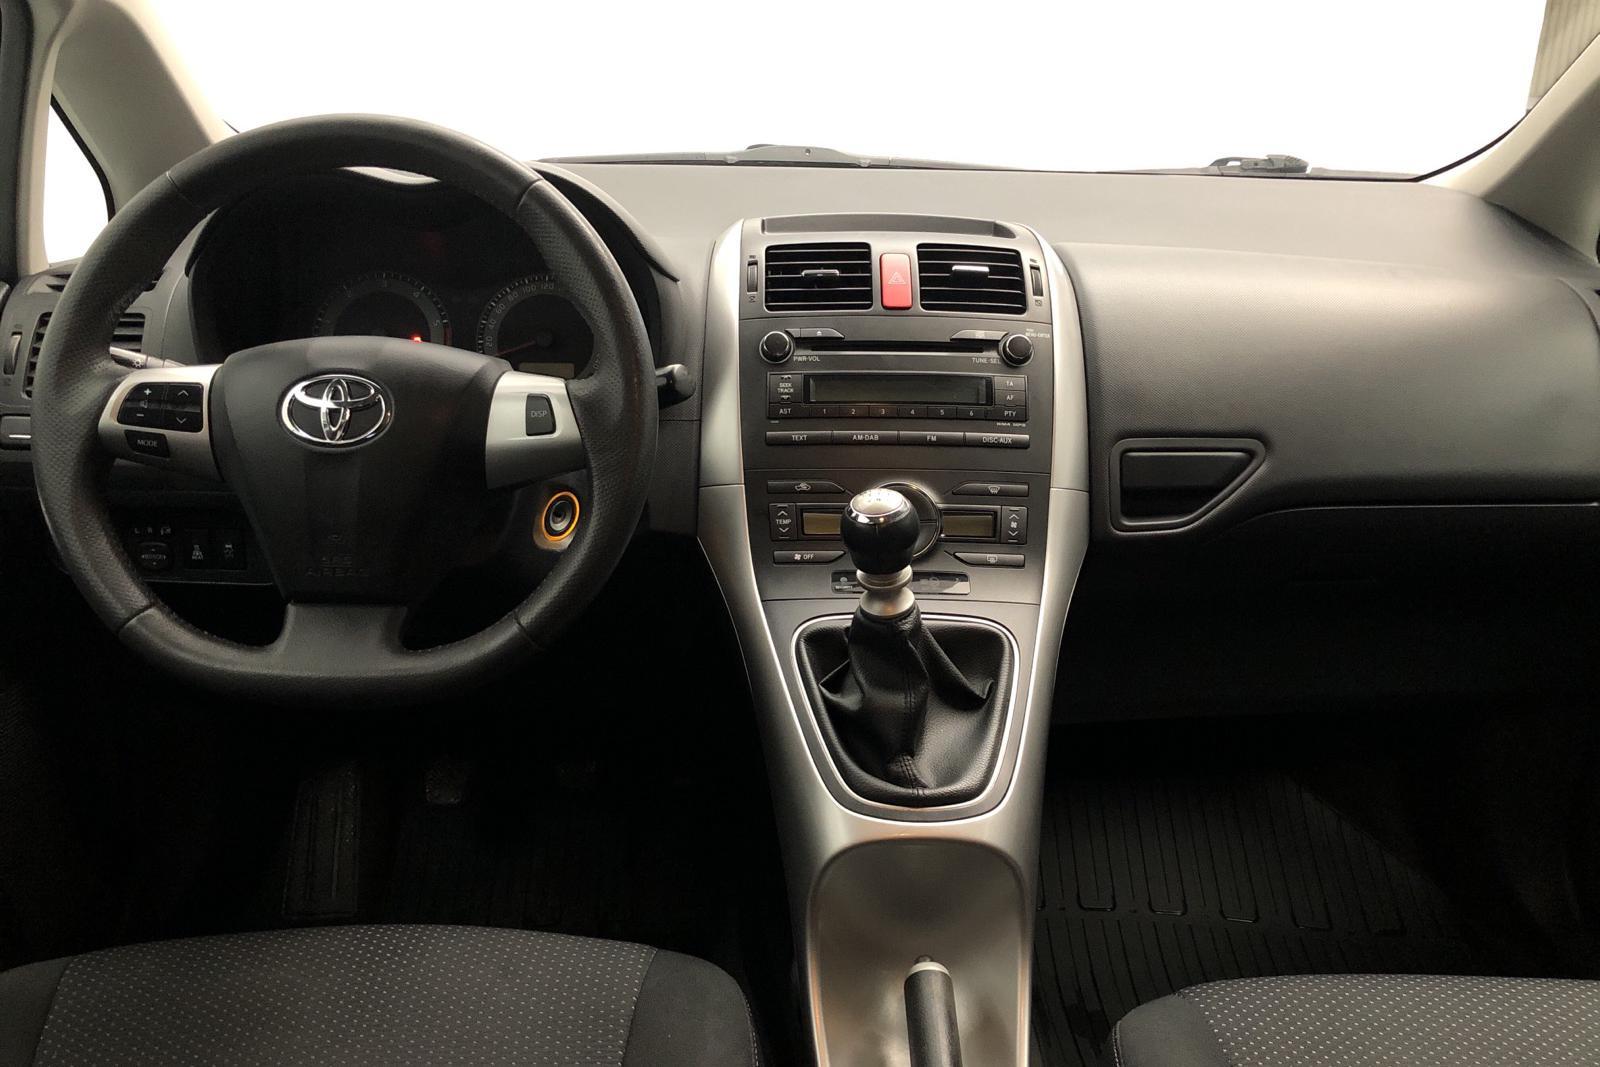 Toyota Auris 1.4 D-4D 5dr (90hk) - 120 240 km - Manual - Dark Grey - 2011